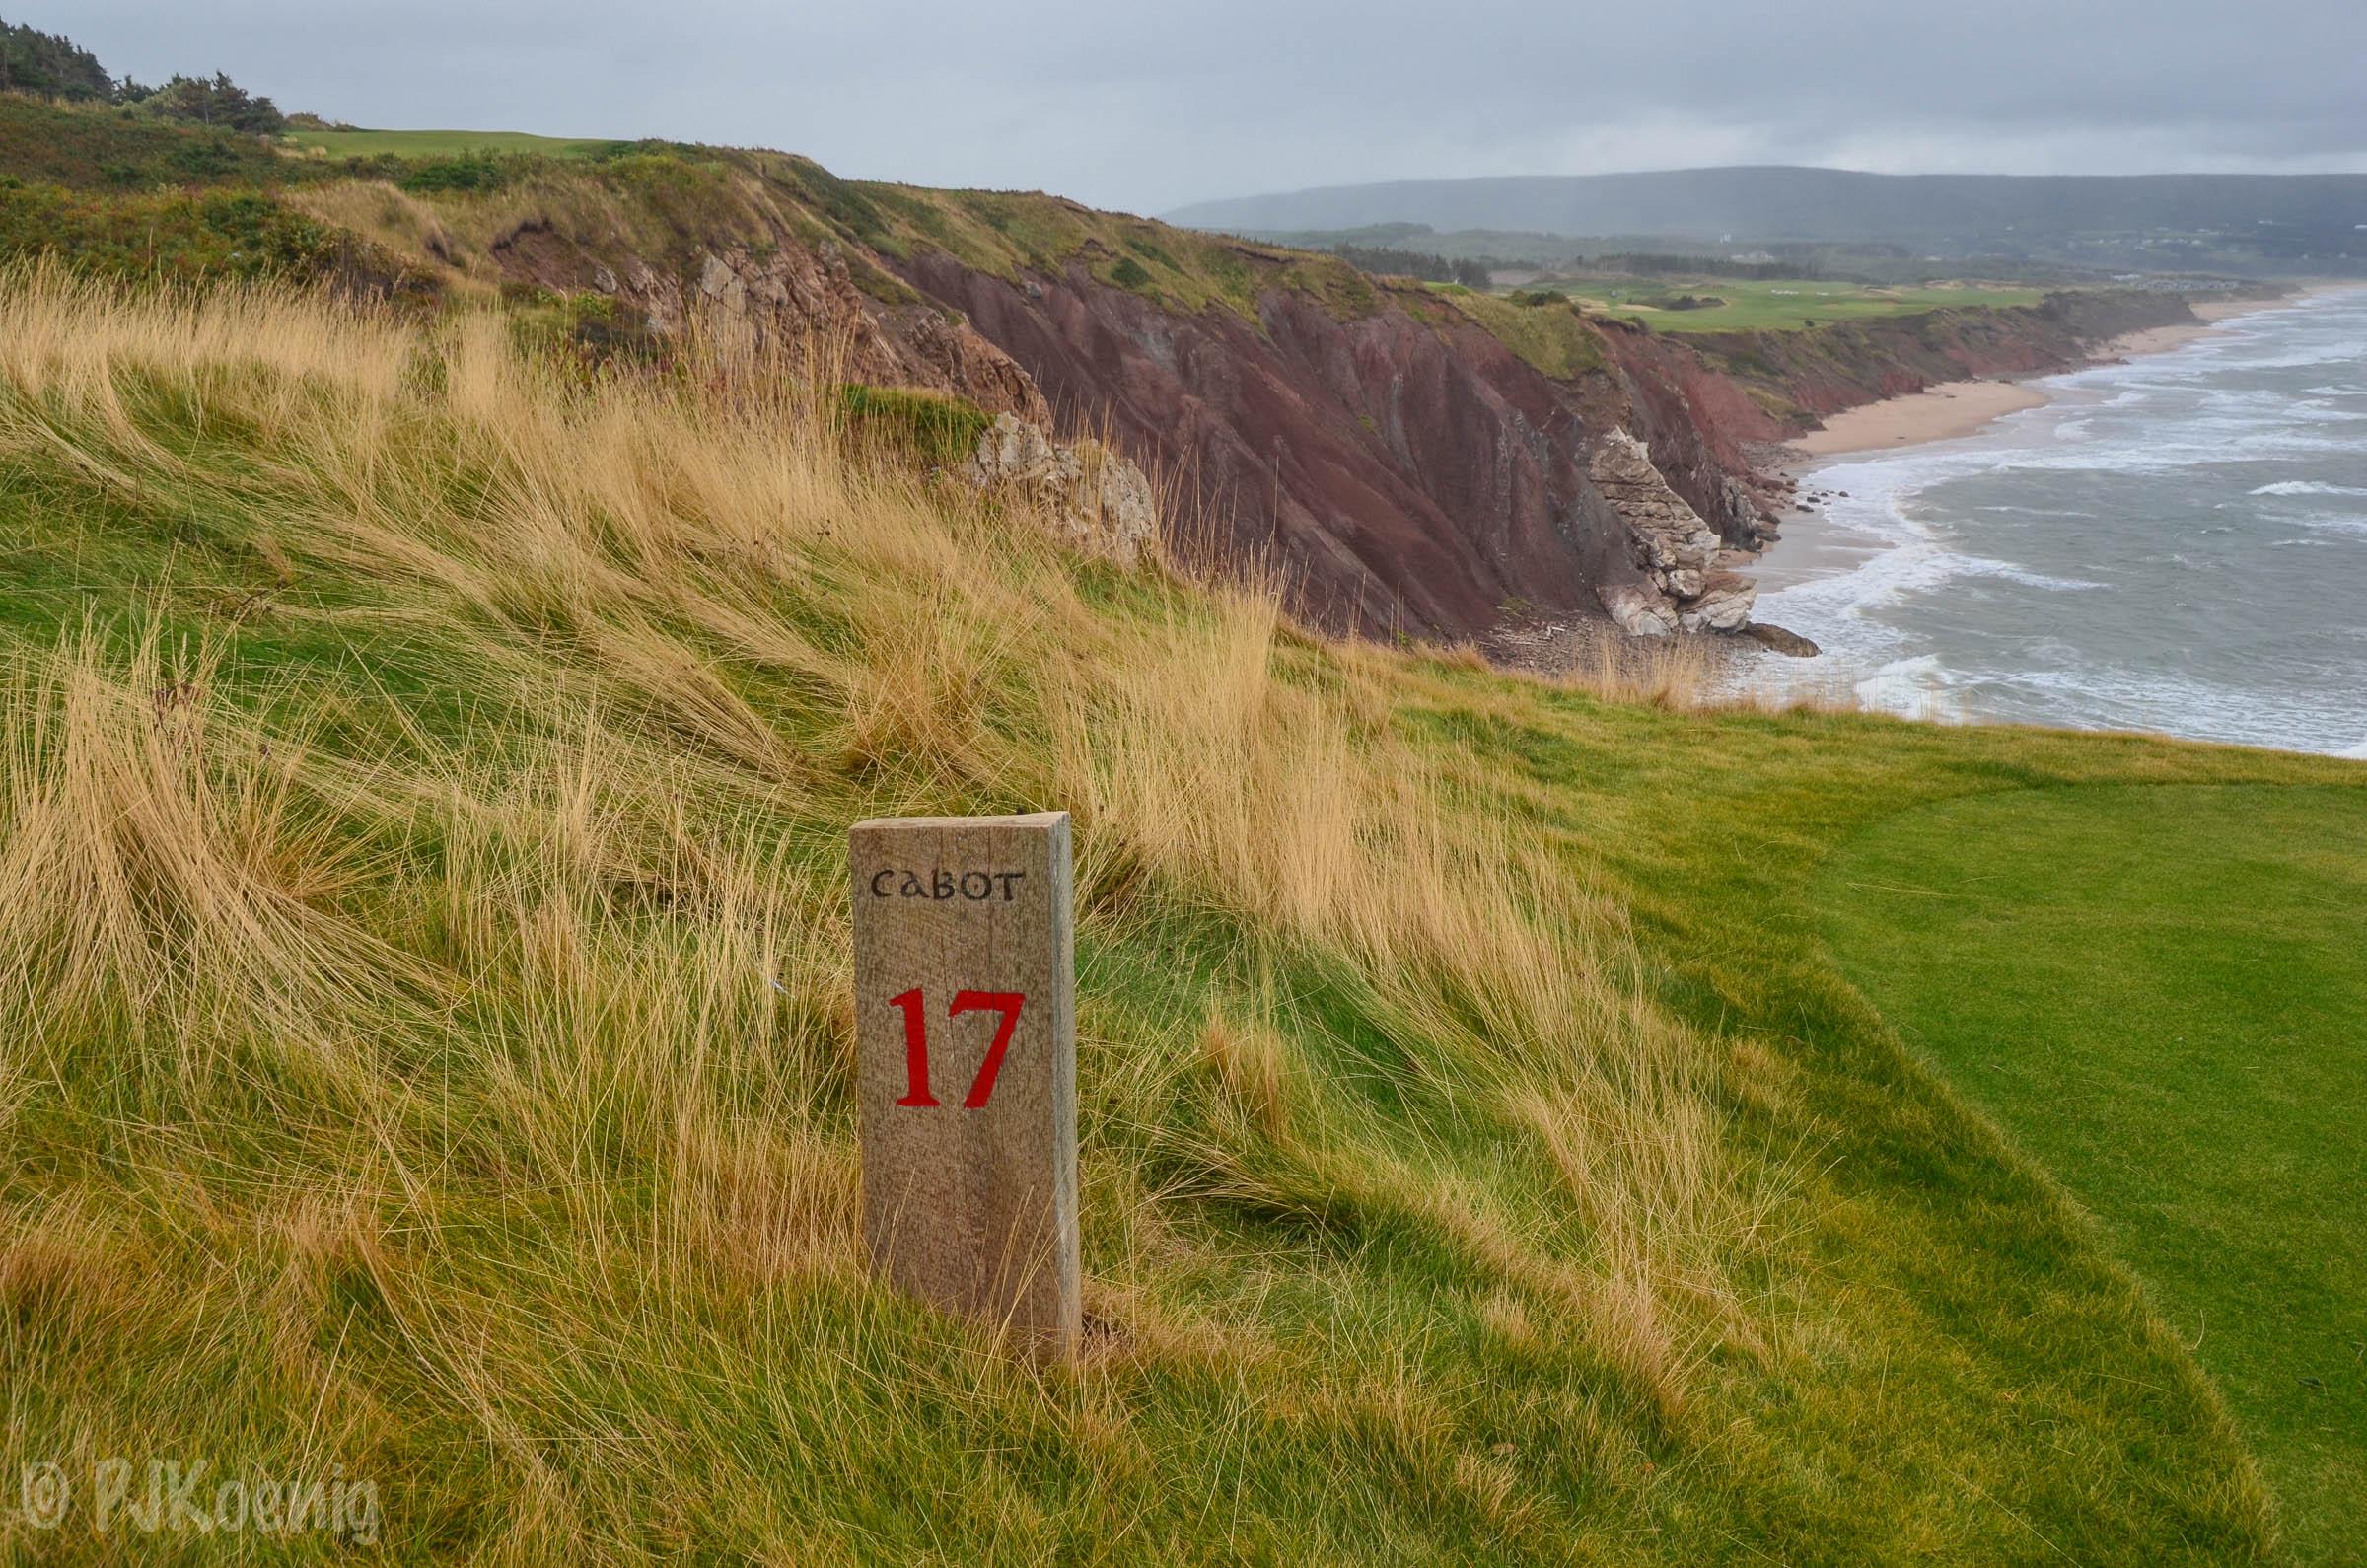 Cabot Cliffs1-112.jpg